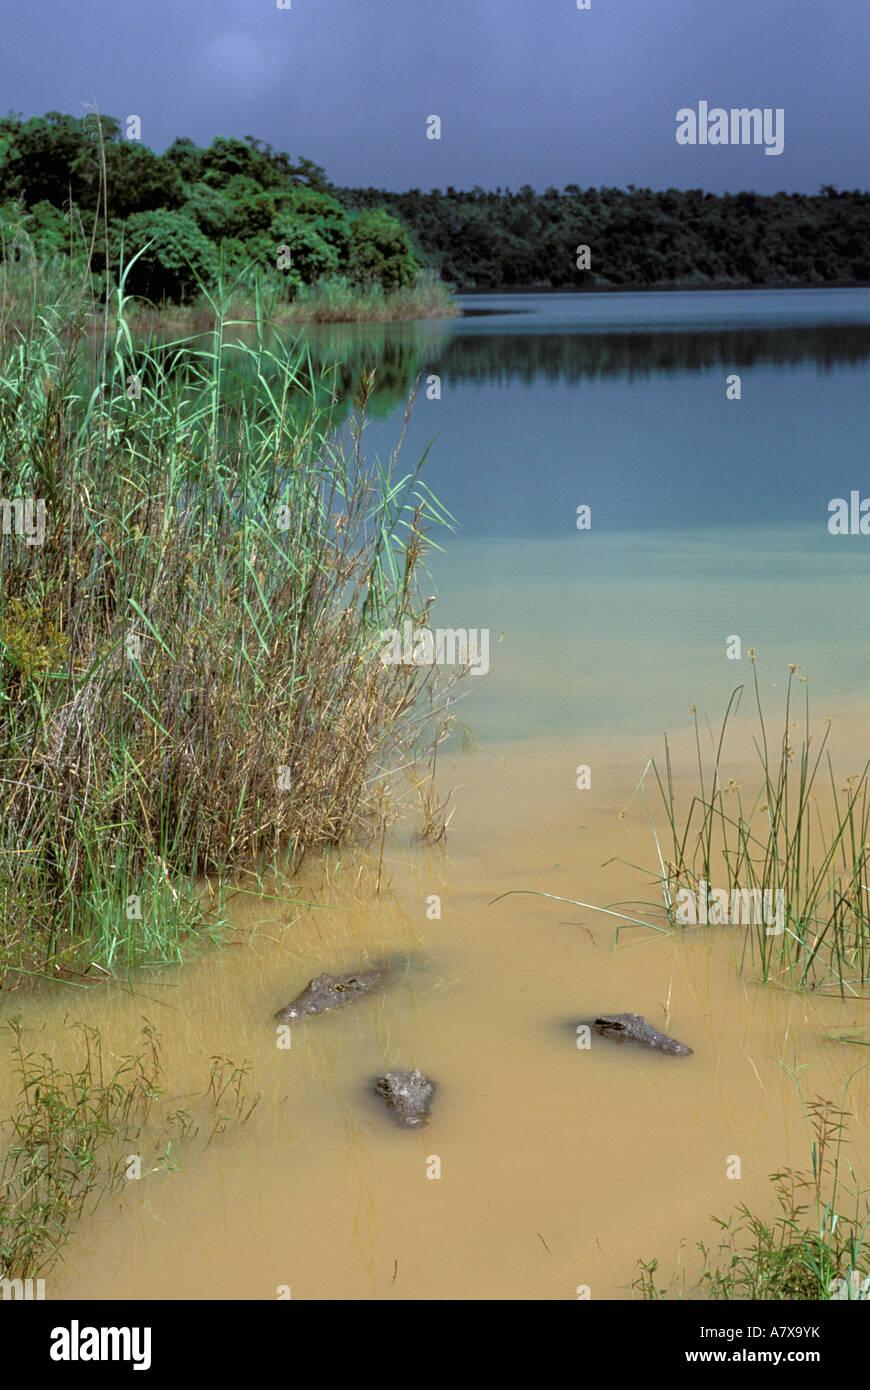 Afrika, Madagaskar, Ambilobe, heiliger See. Nilkrokodile (Crocodylus Niloticus) Stockbild